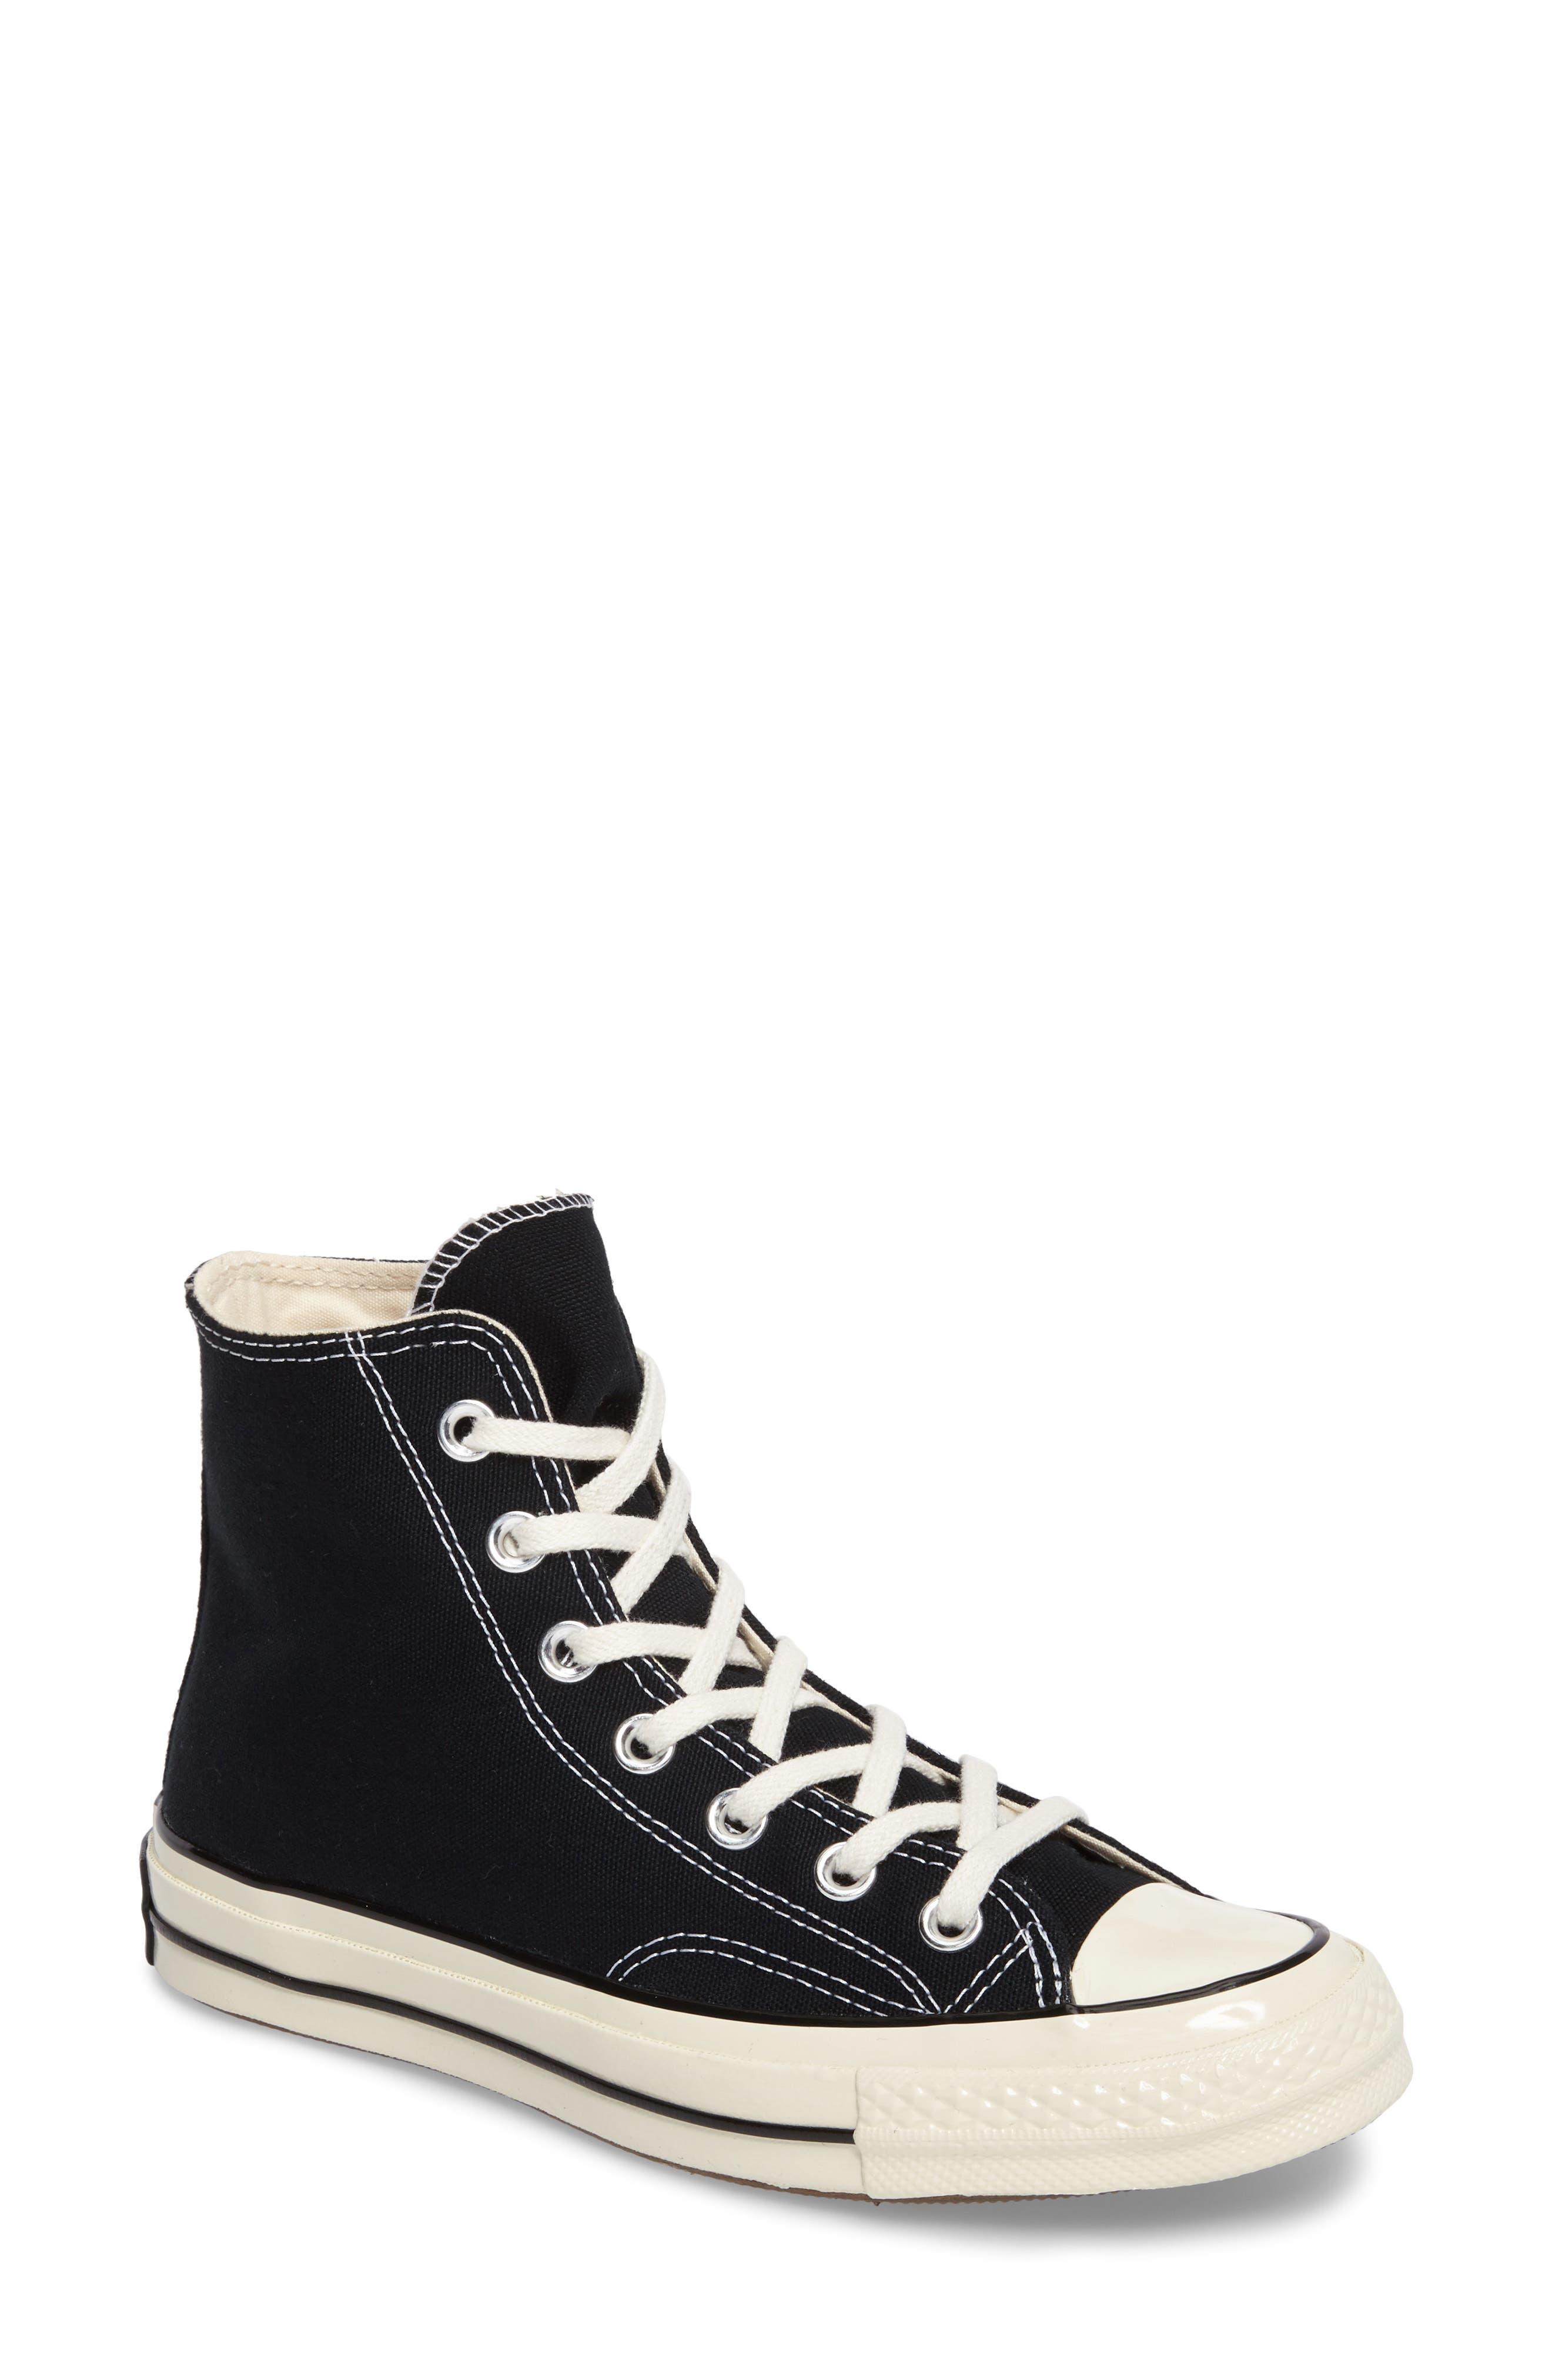 Chuck Taylor<sup>®</sup> All Star<sup>®</sup> '70 High Top Sneaker,                             Main thumbnail 1, color,                             001